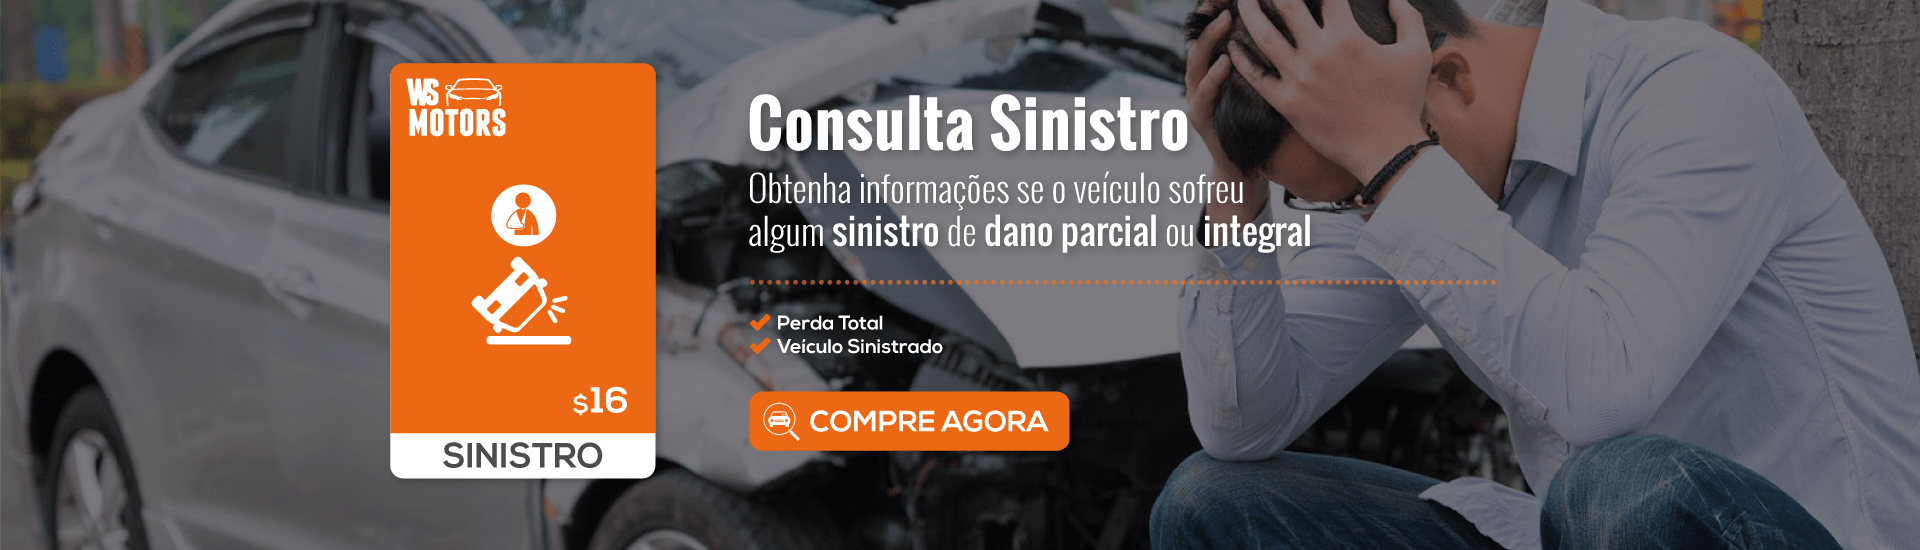 Consulta Sinistro